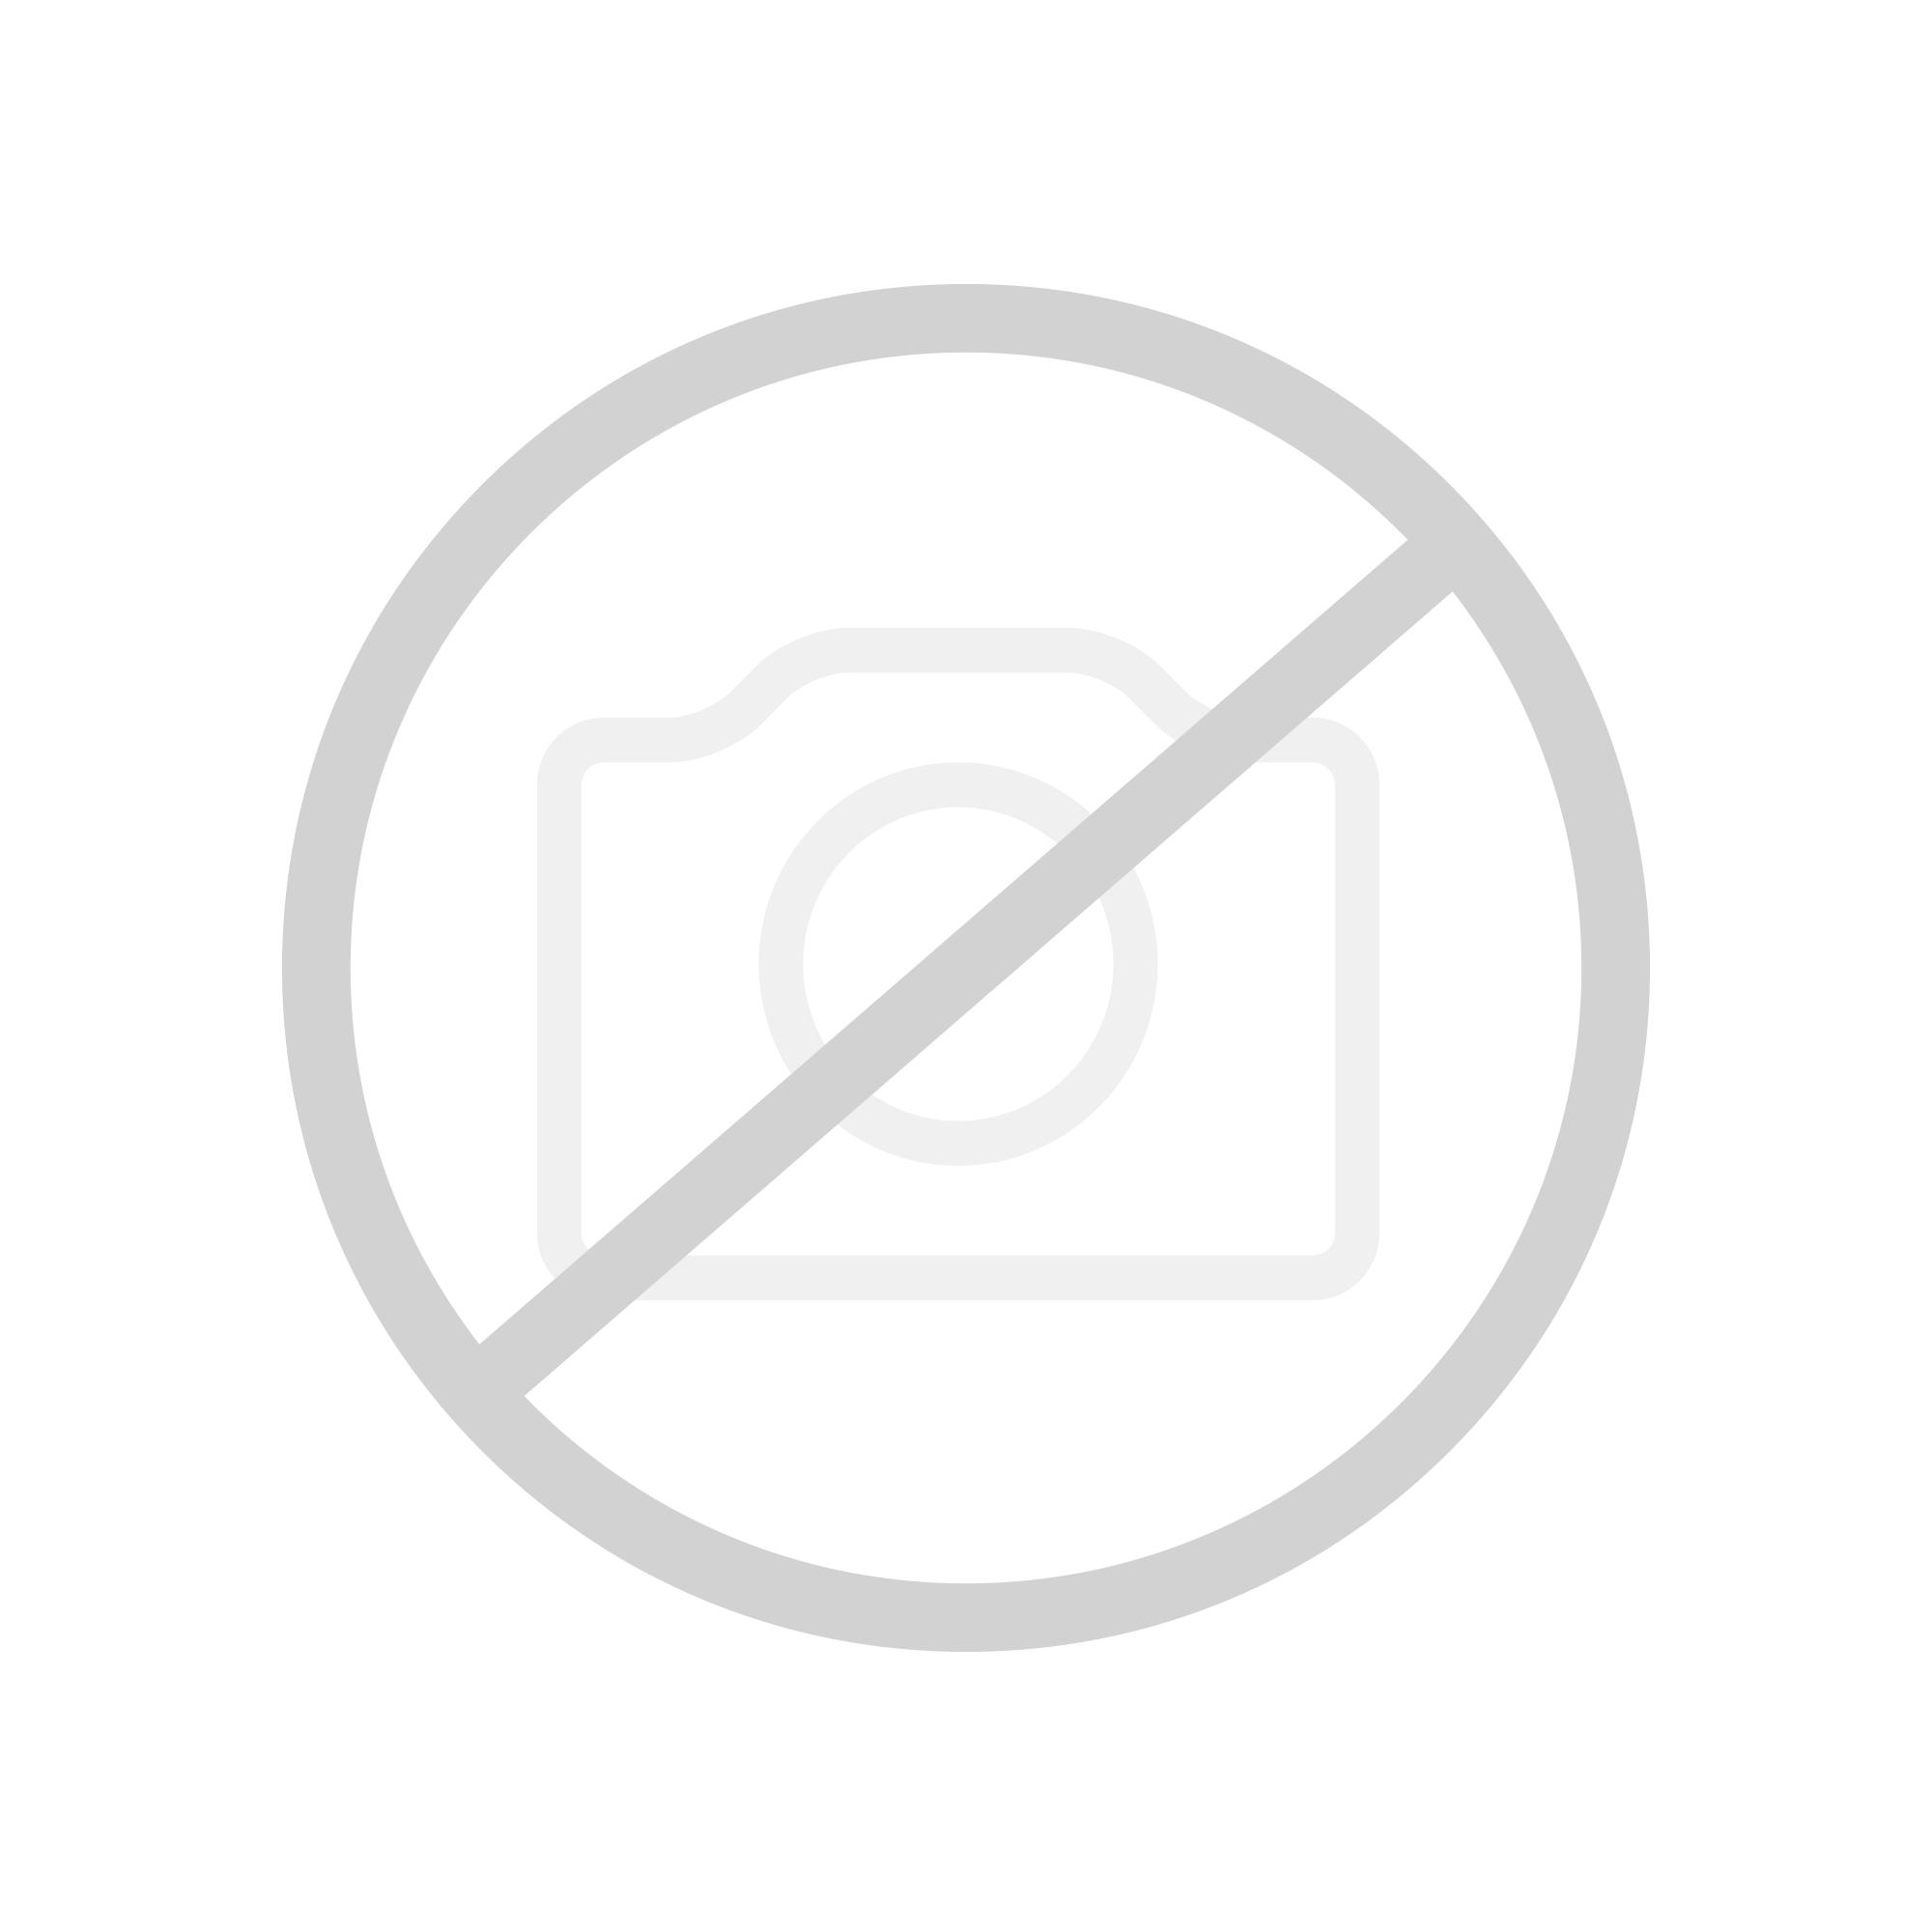 emco unterputz modul sonstige preisvergleiche. Black Bedroom Furniture Sets. Home Design Ideas